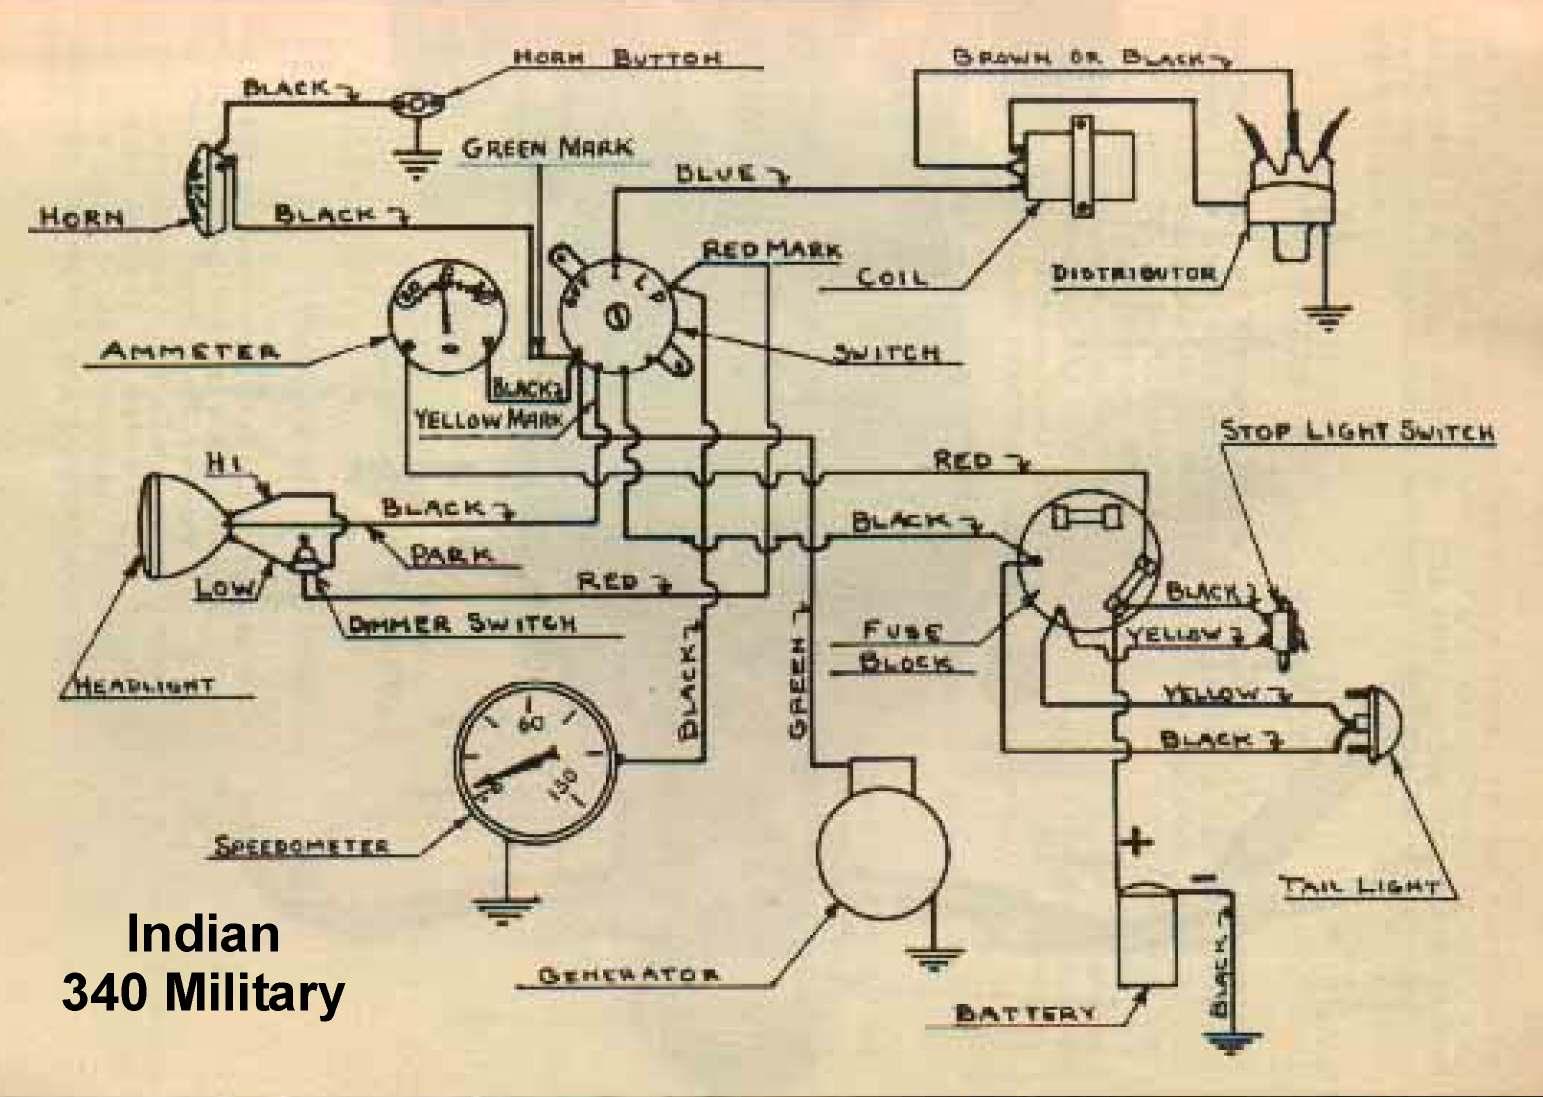 [SCHEMATICS_44OR]  OH_8943] 1946 Indian Chief Wiring Diagram Download Diagram   Indian Motorcycle Wiring Diagram      Redne Ally Groa Boapu Mohammedshrine Librar Wiring 101